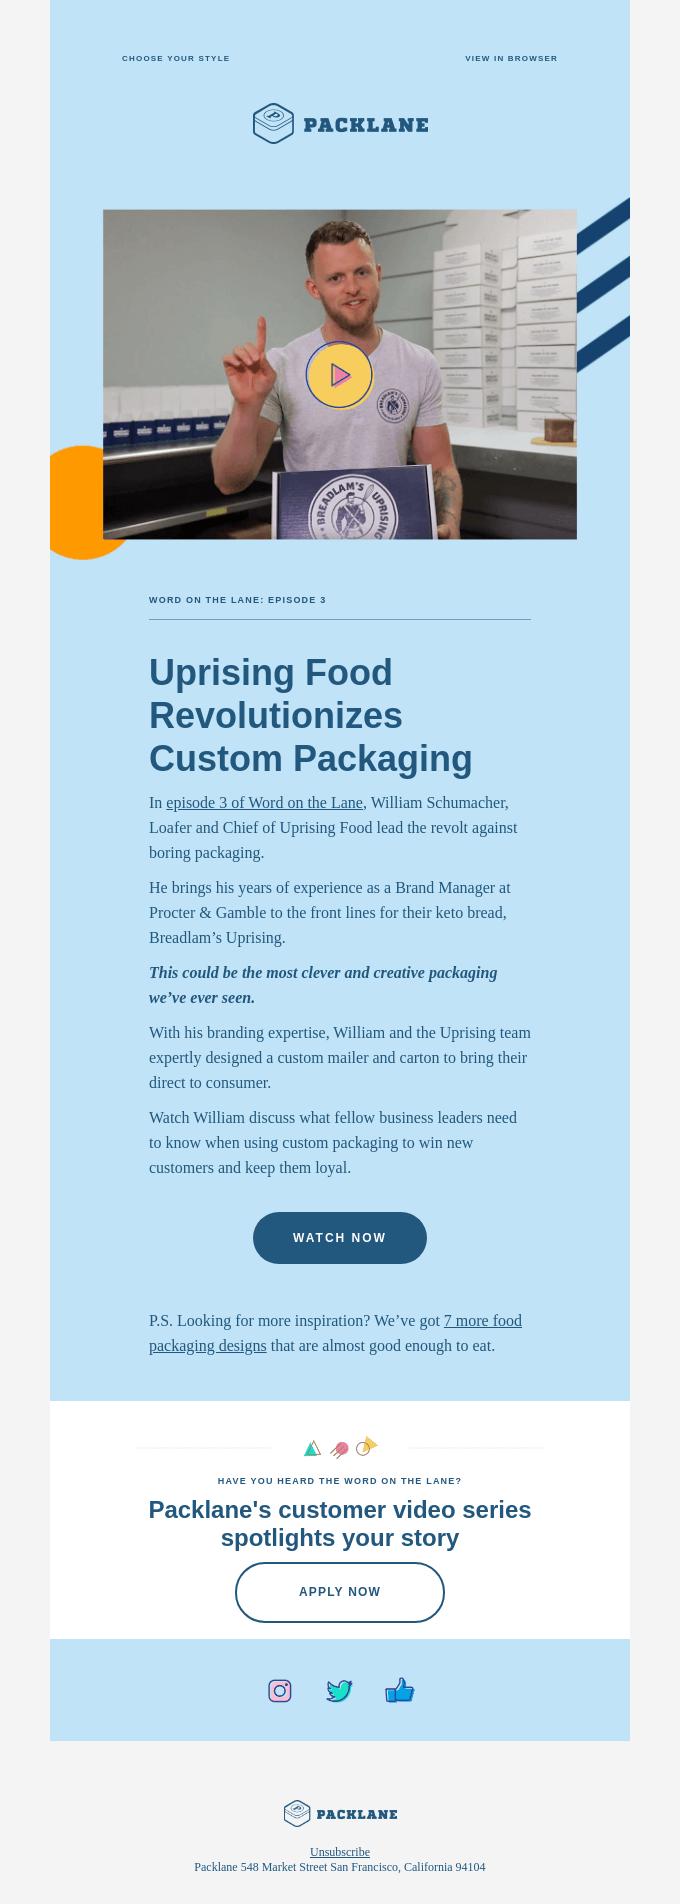 Word on the Lane episode 3: Uprising Food 🍞